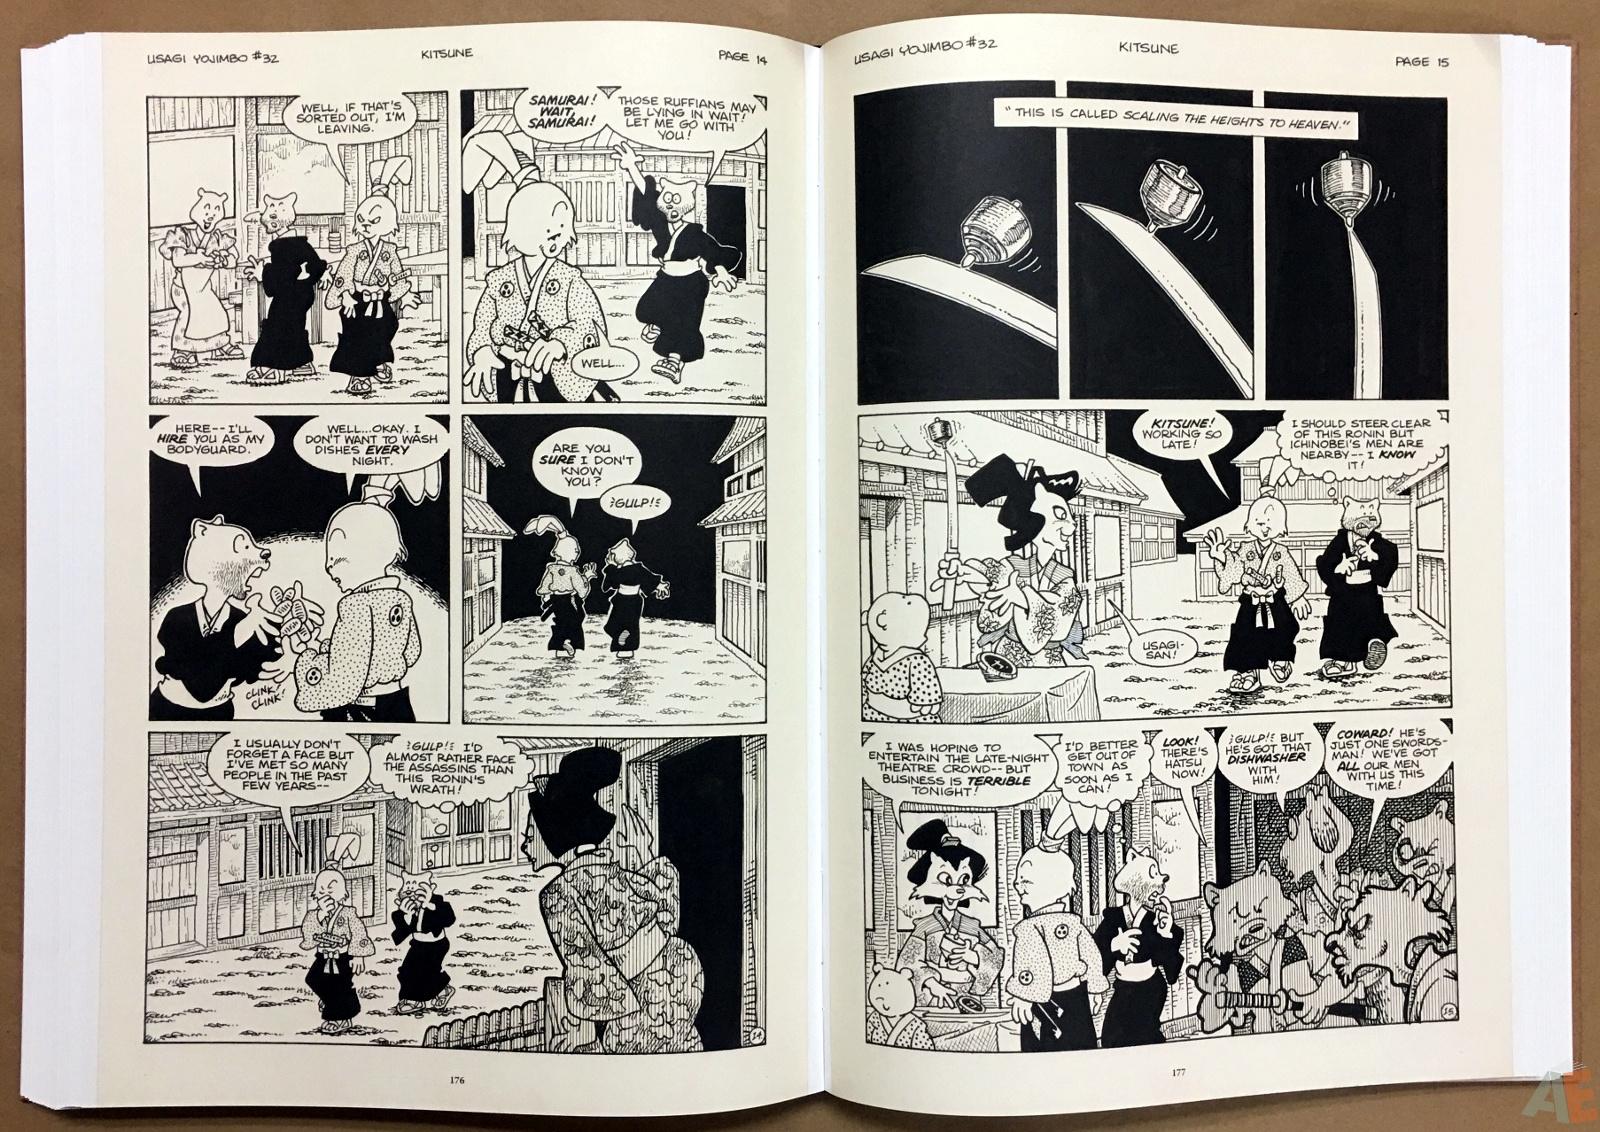 Usagi Yojimbo: Samurai and Other Stories Gallery Edition 32